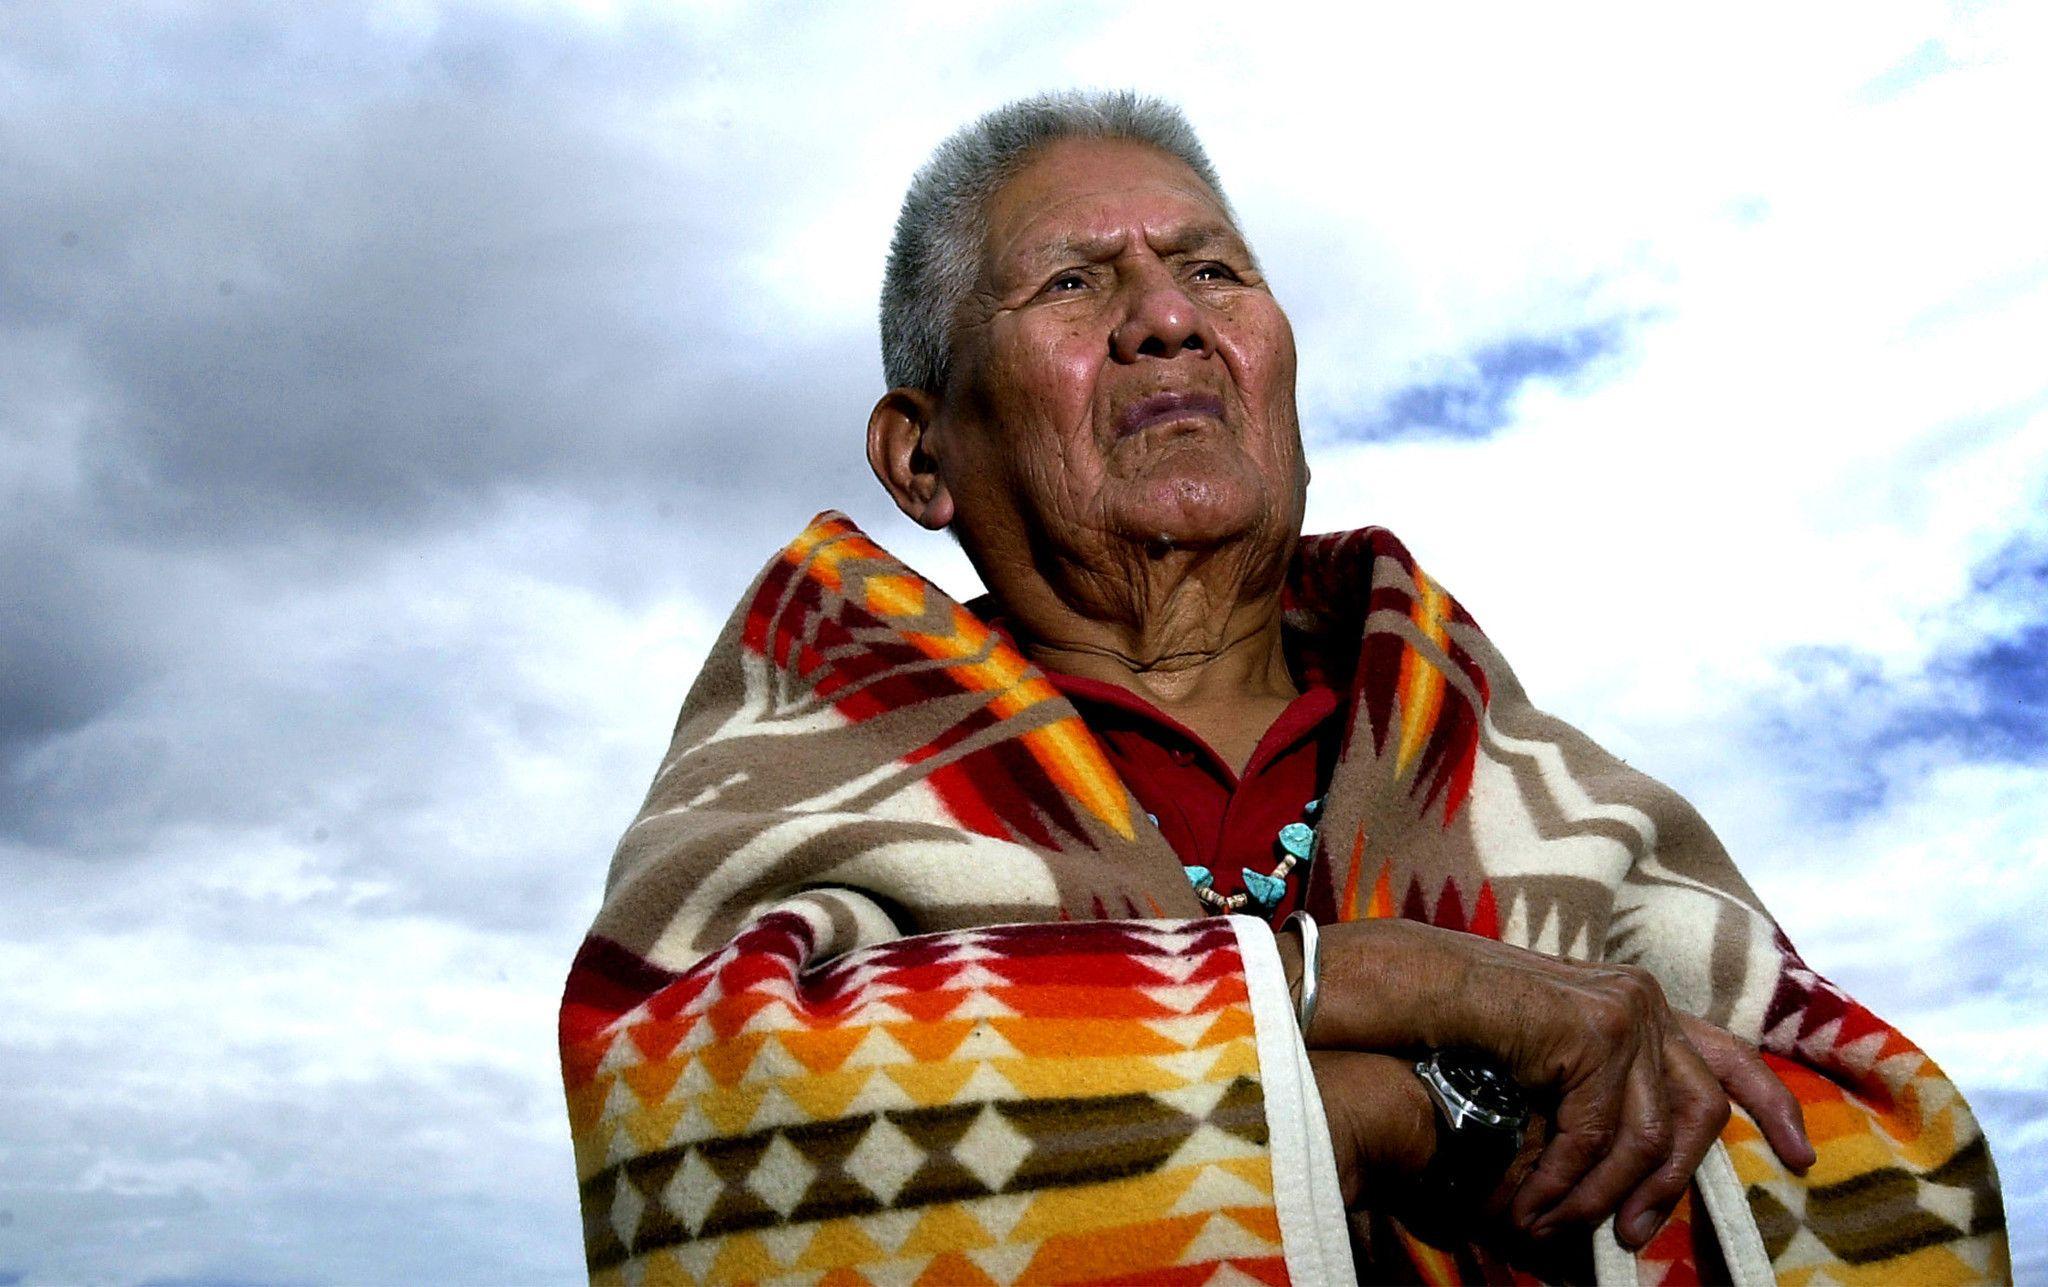 Chester Nez 93 Was Last Of The Original Navajo Code